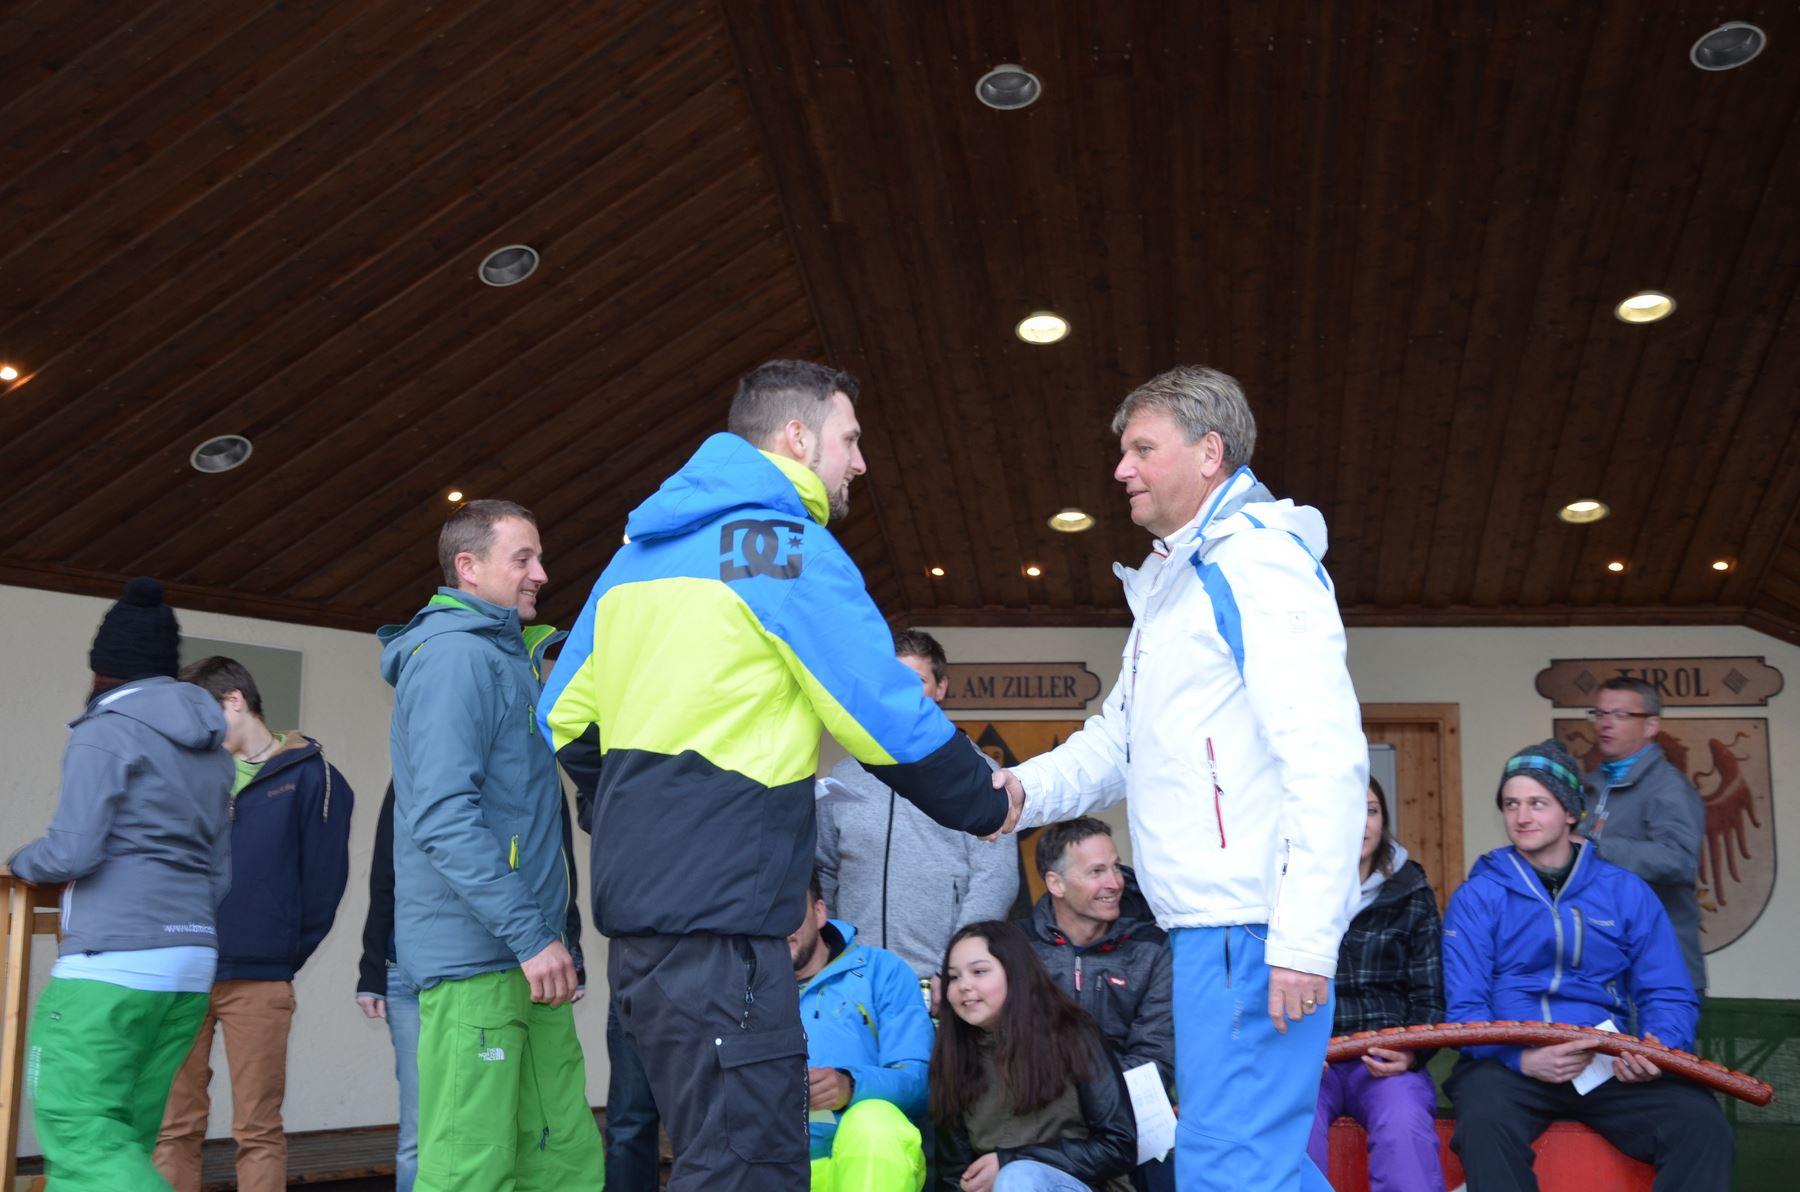 2015-03-22 BV Zillertal Skirennen 545.JPG